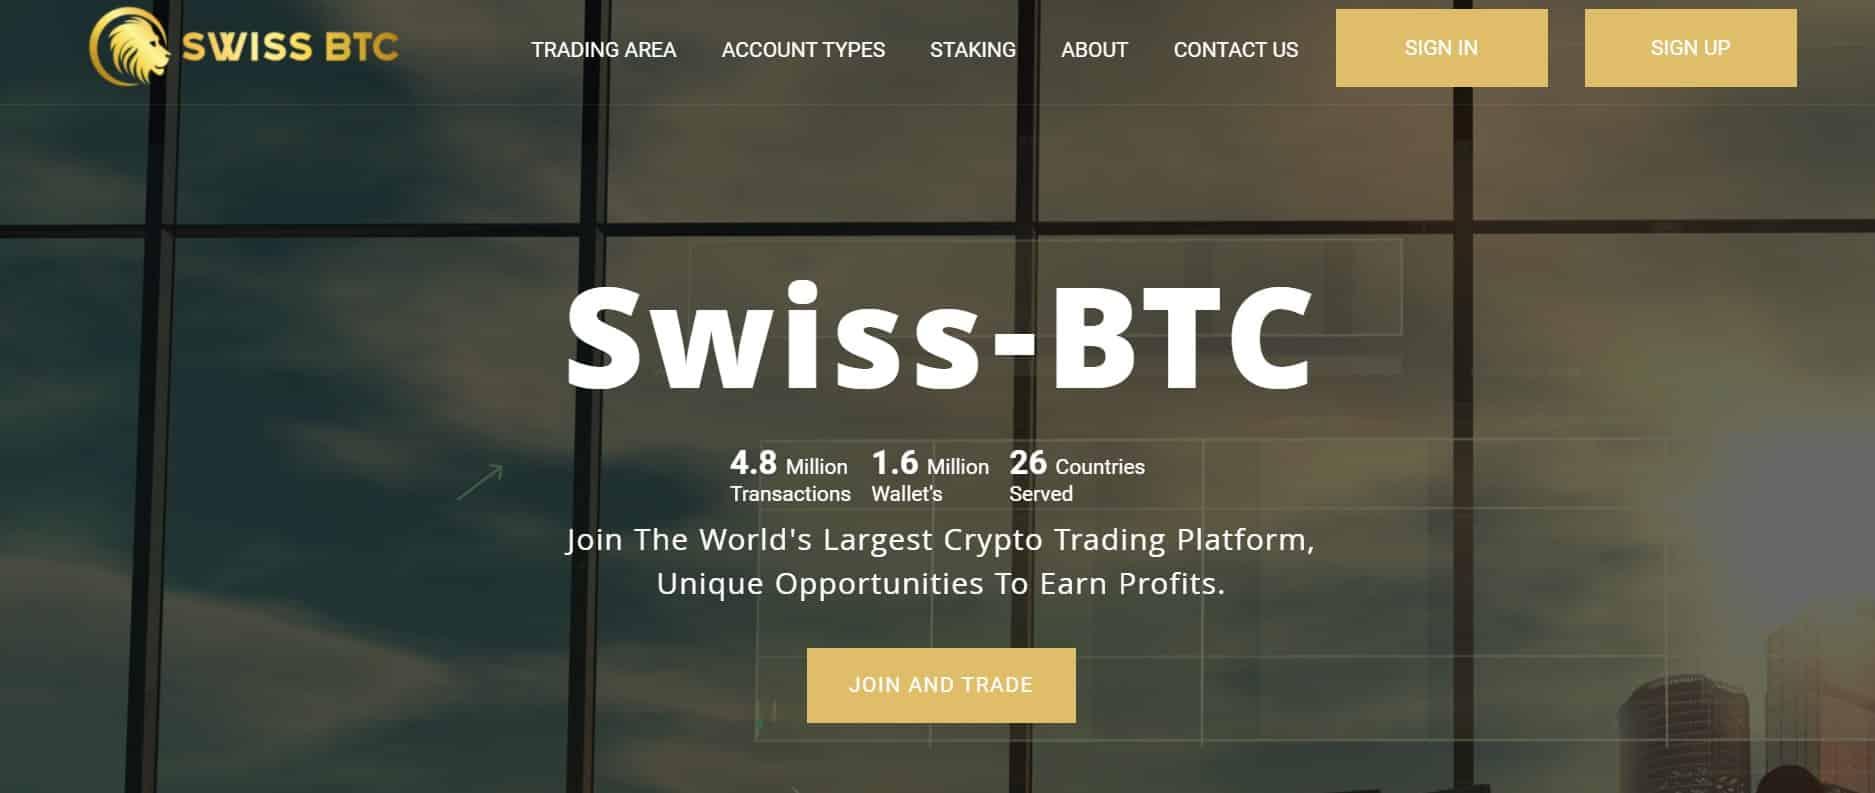 Swiss BTC website